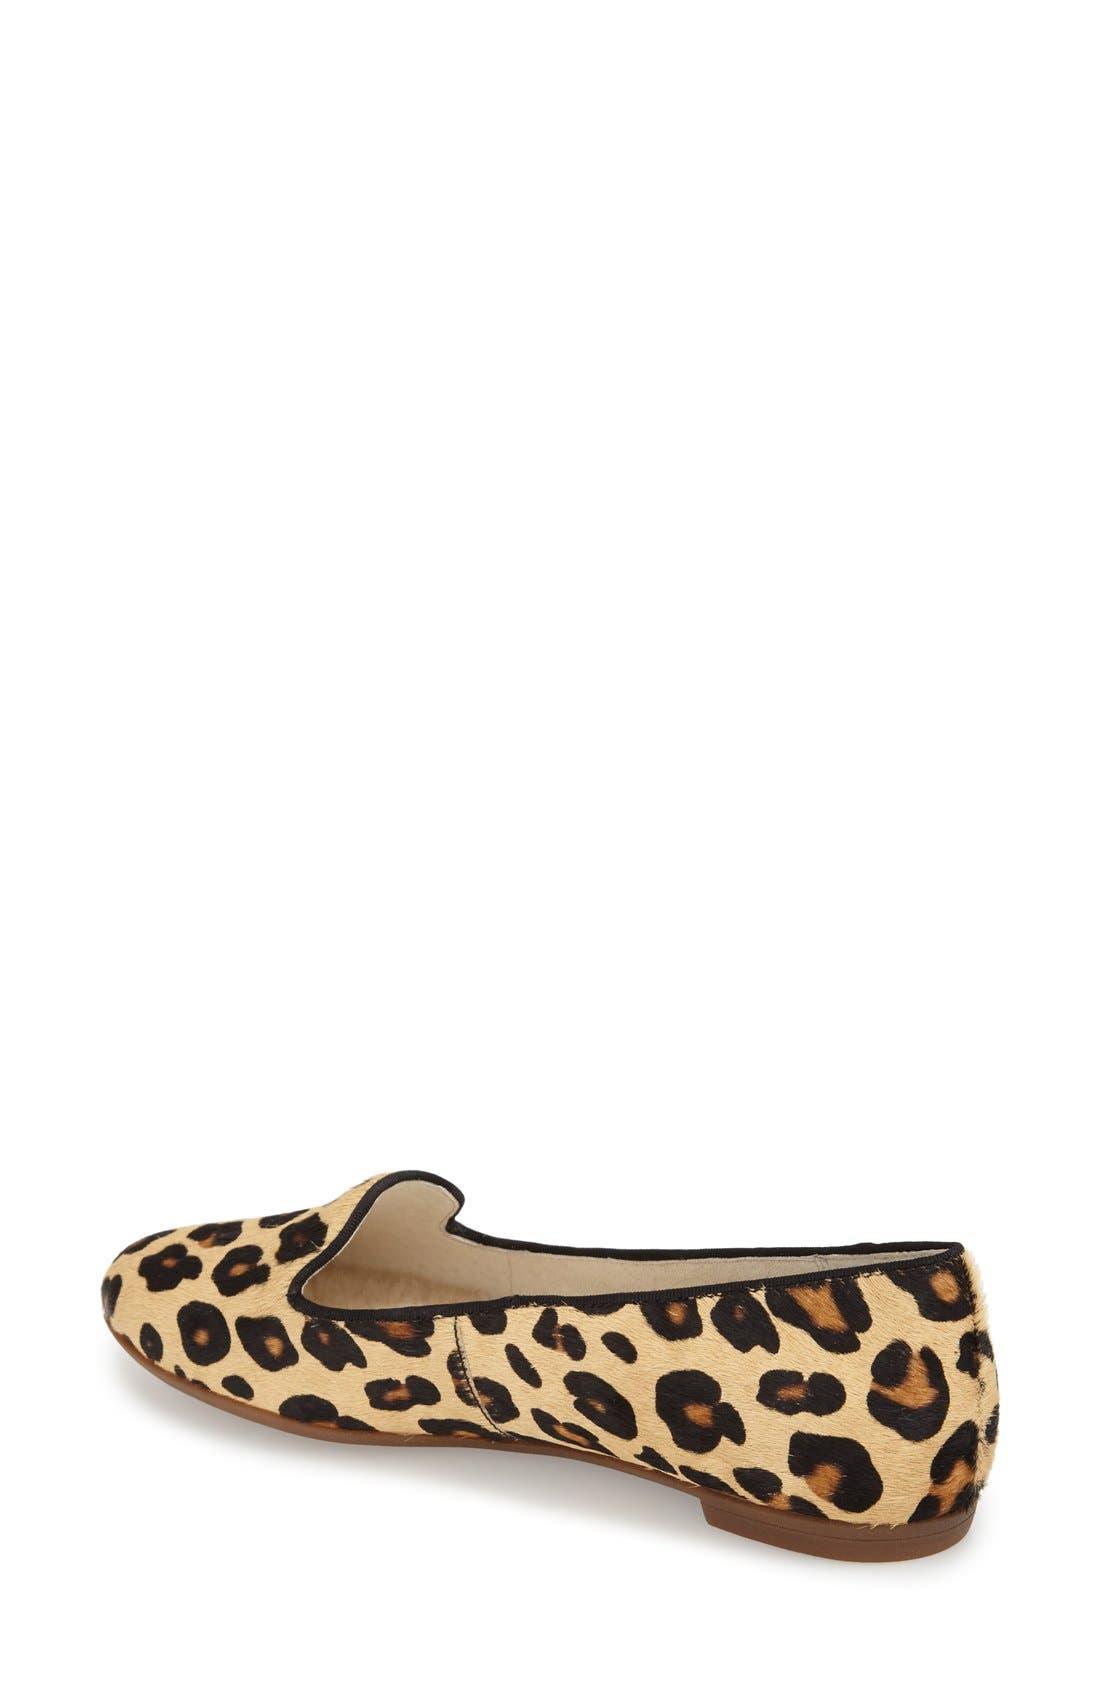 'Blyss' Leopard Spot Calf Hair Flat,                             Alternate thumbnail 2, color,                             200